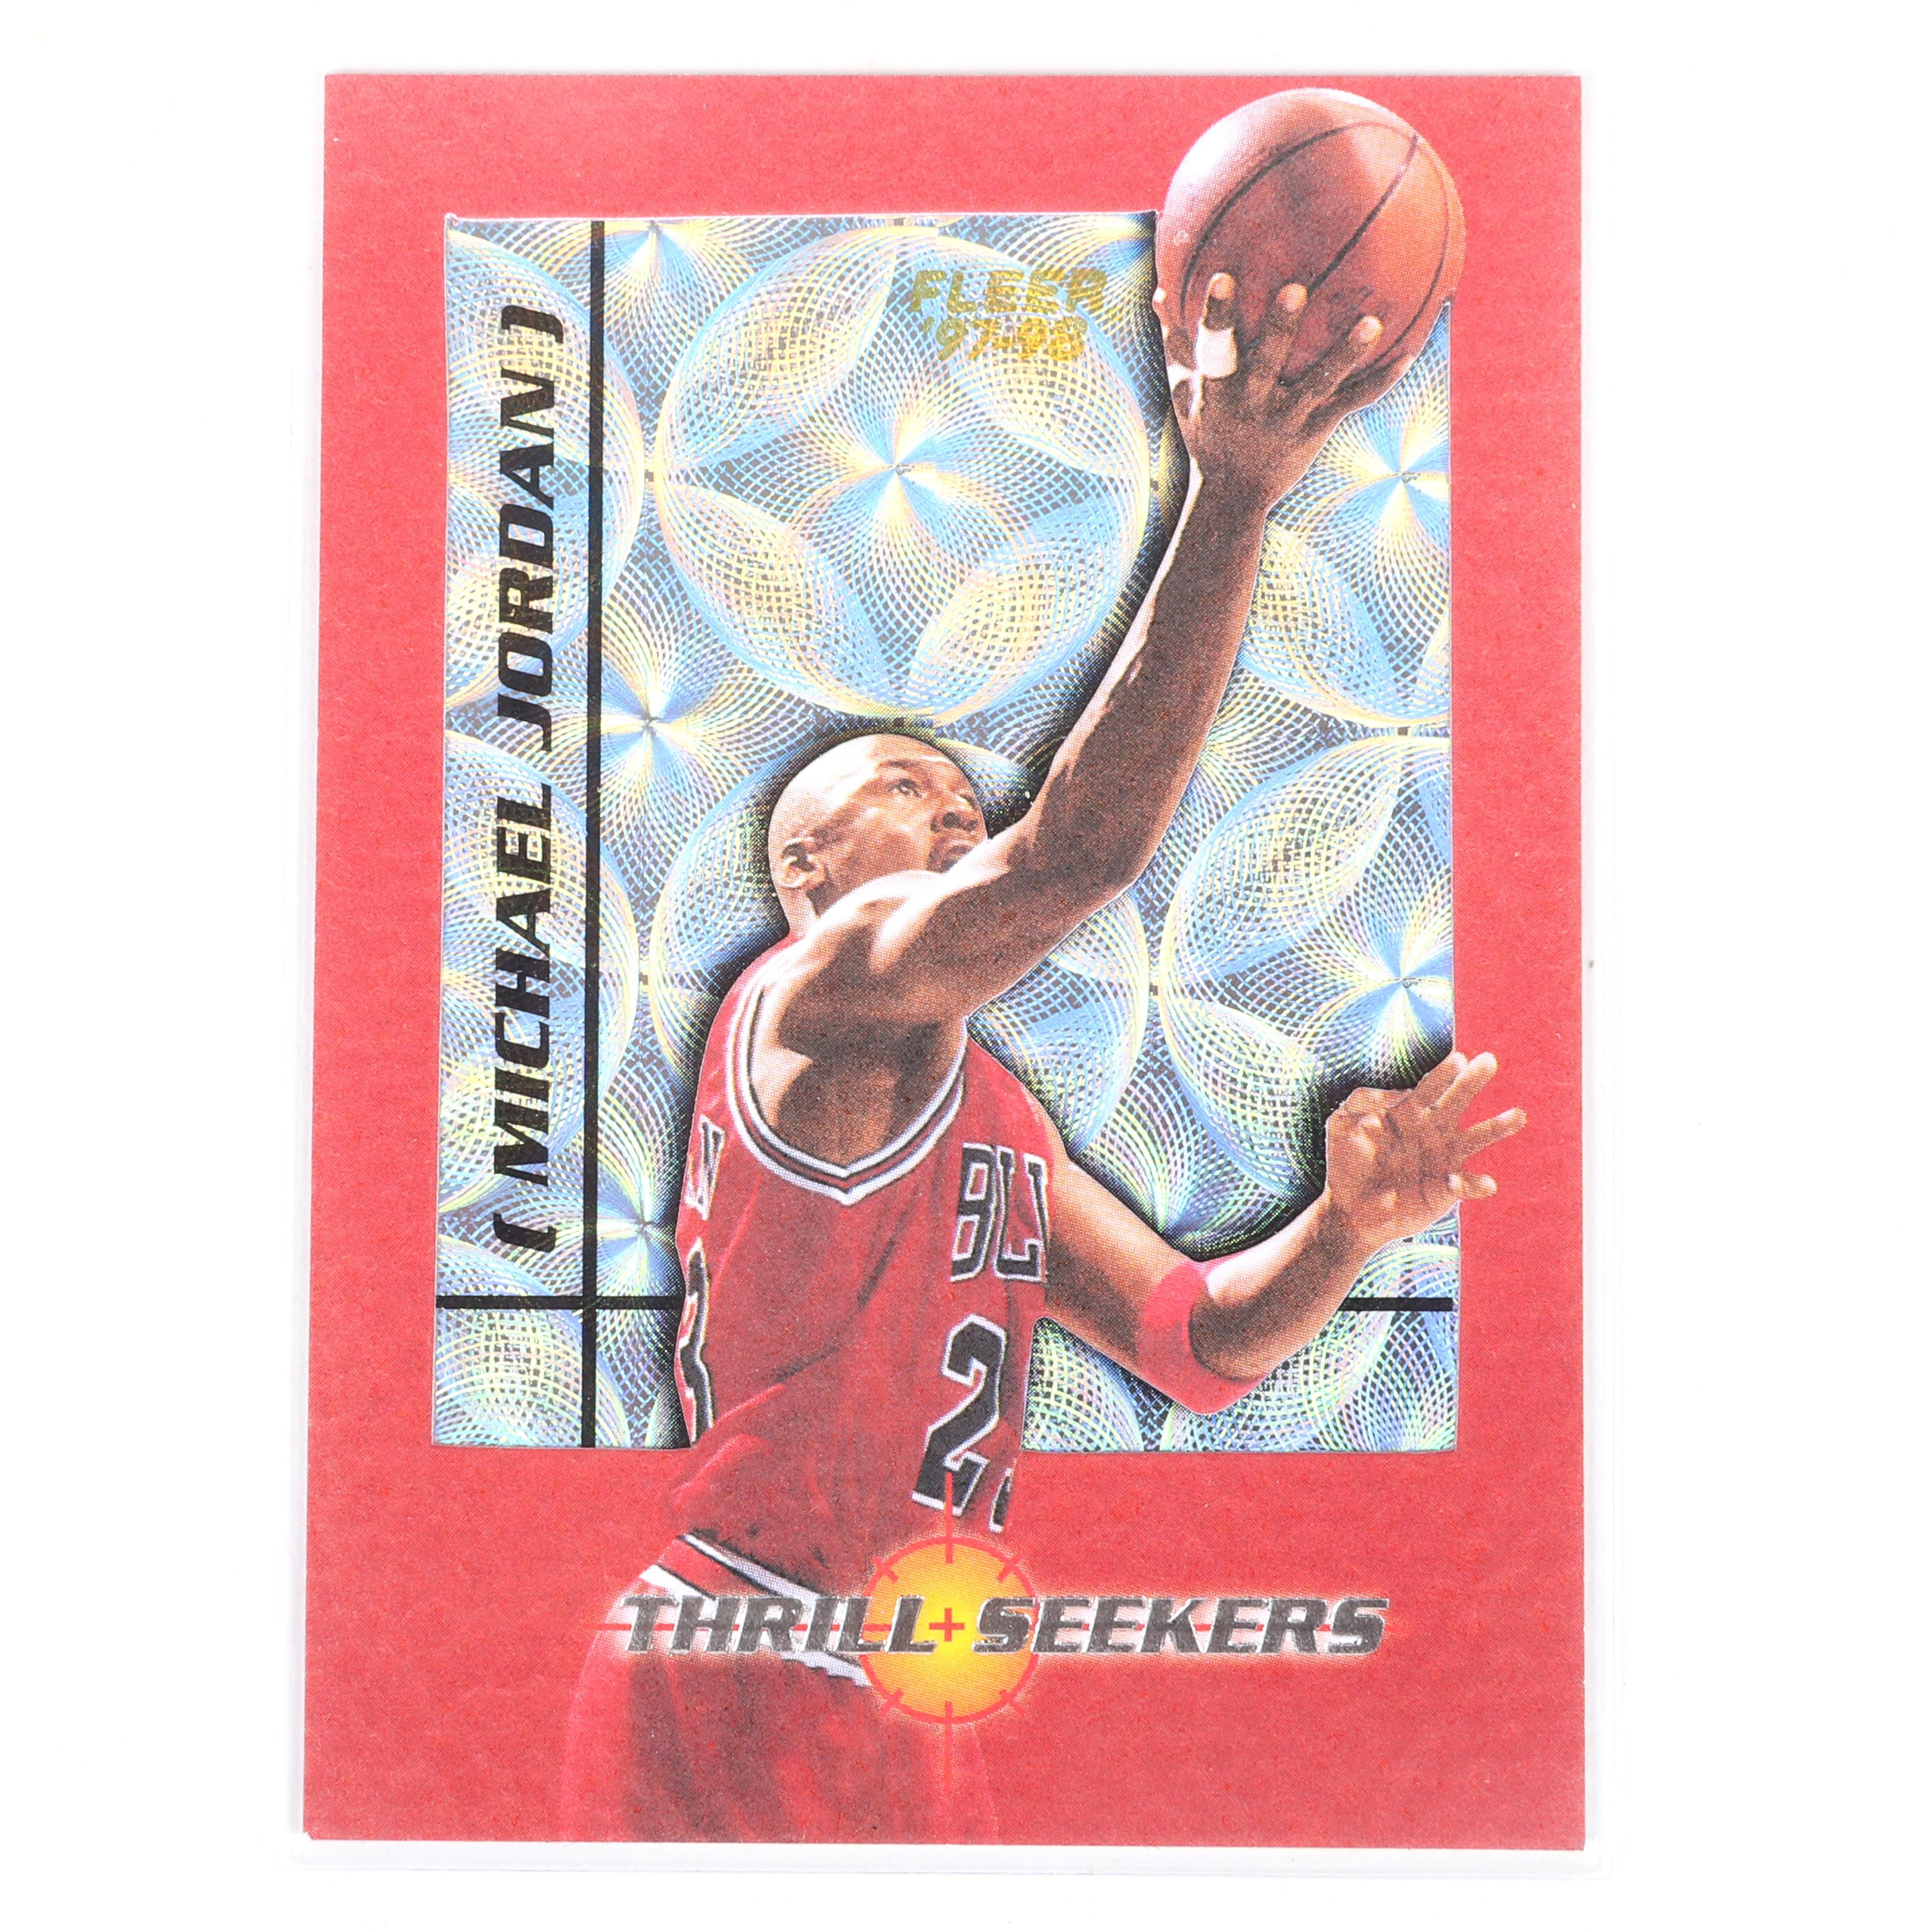 1997-98 Fleer Michael Jordan Thrill Seekers Insert #7